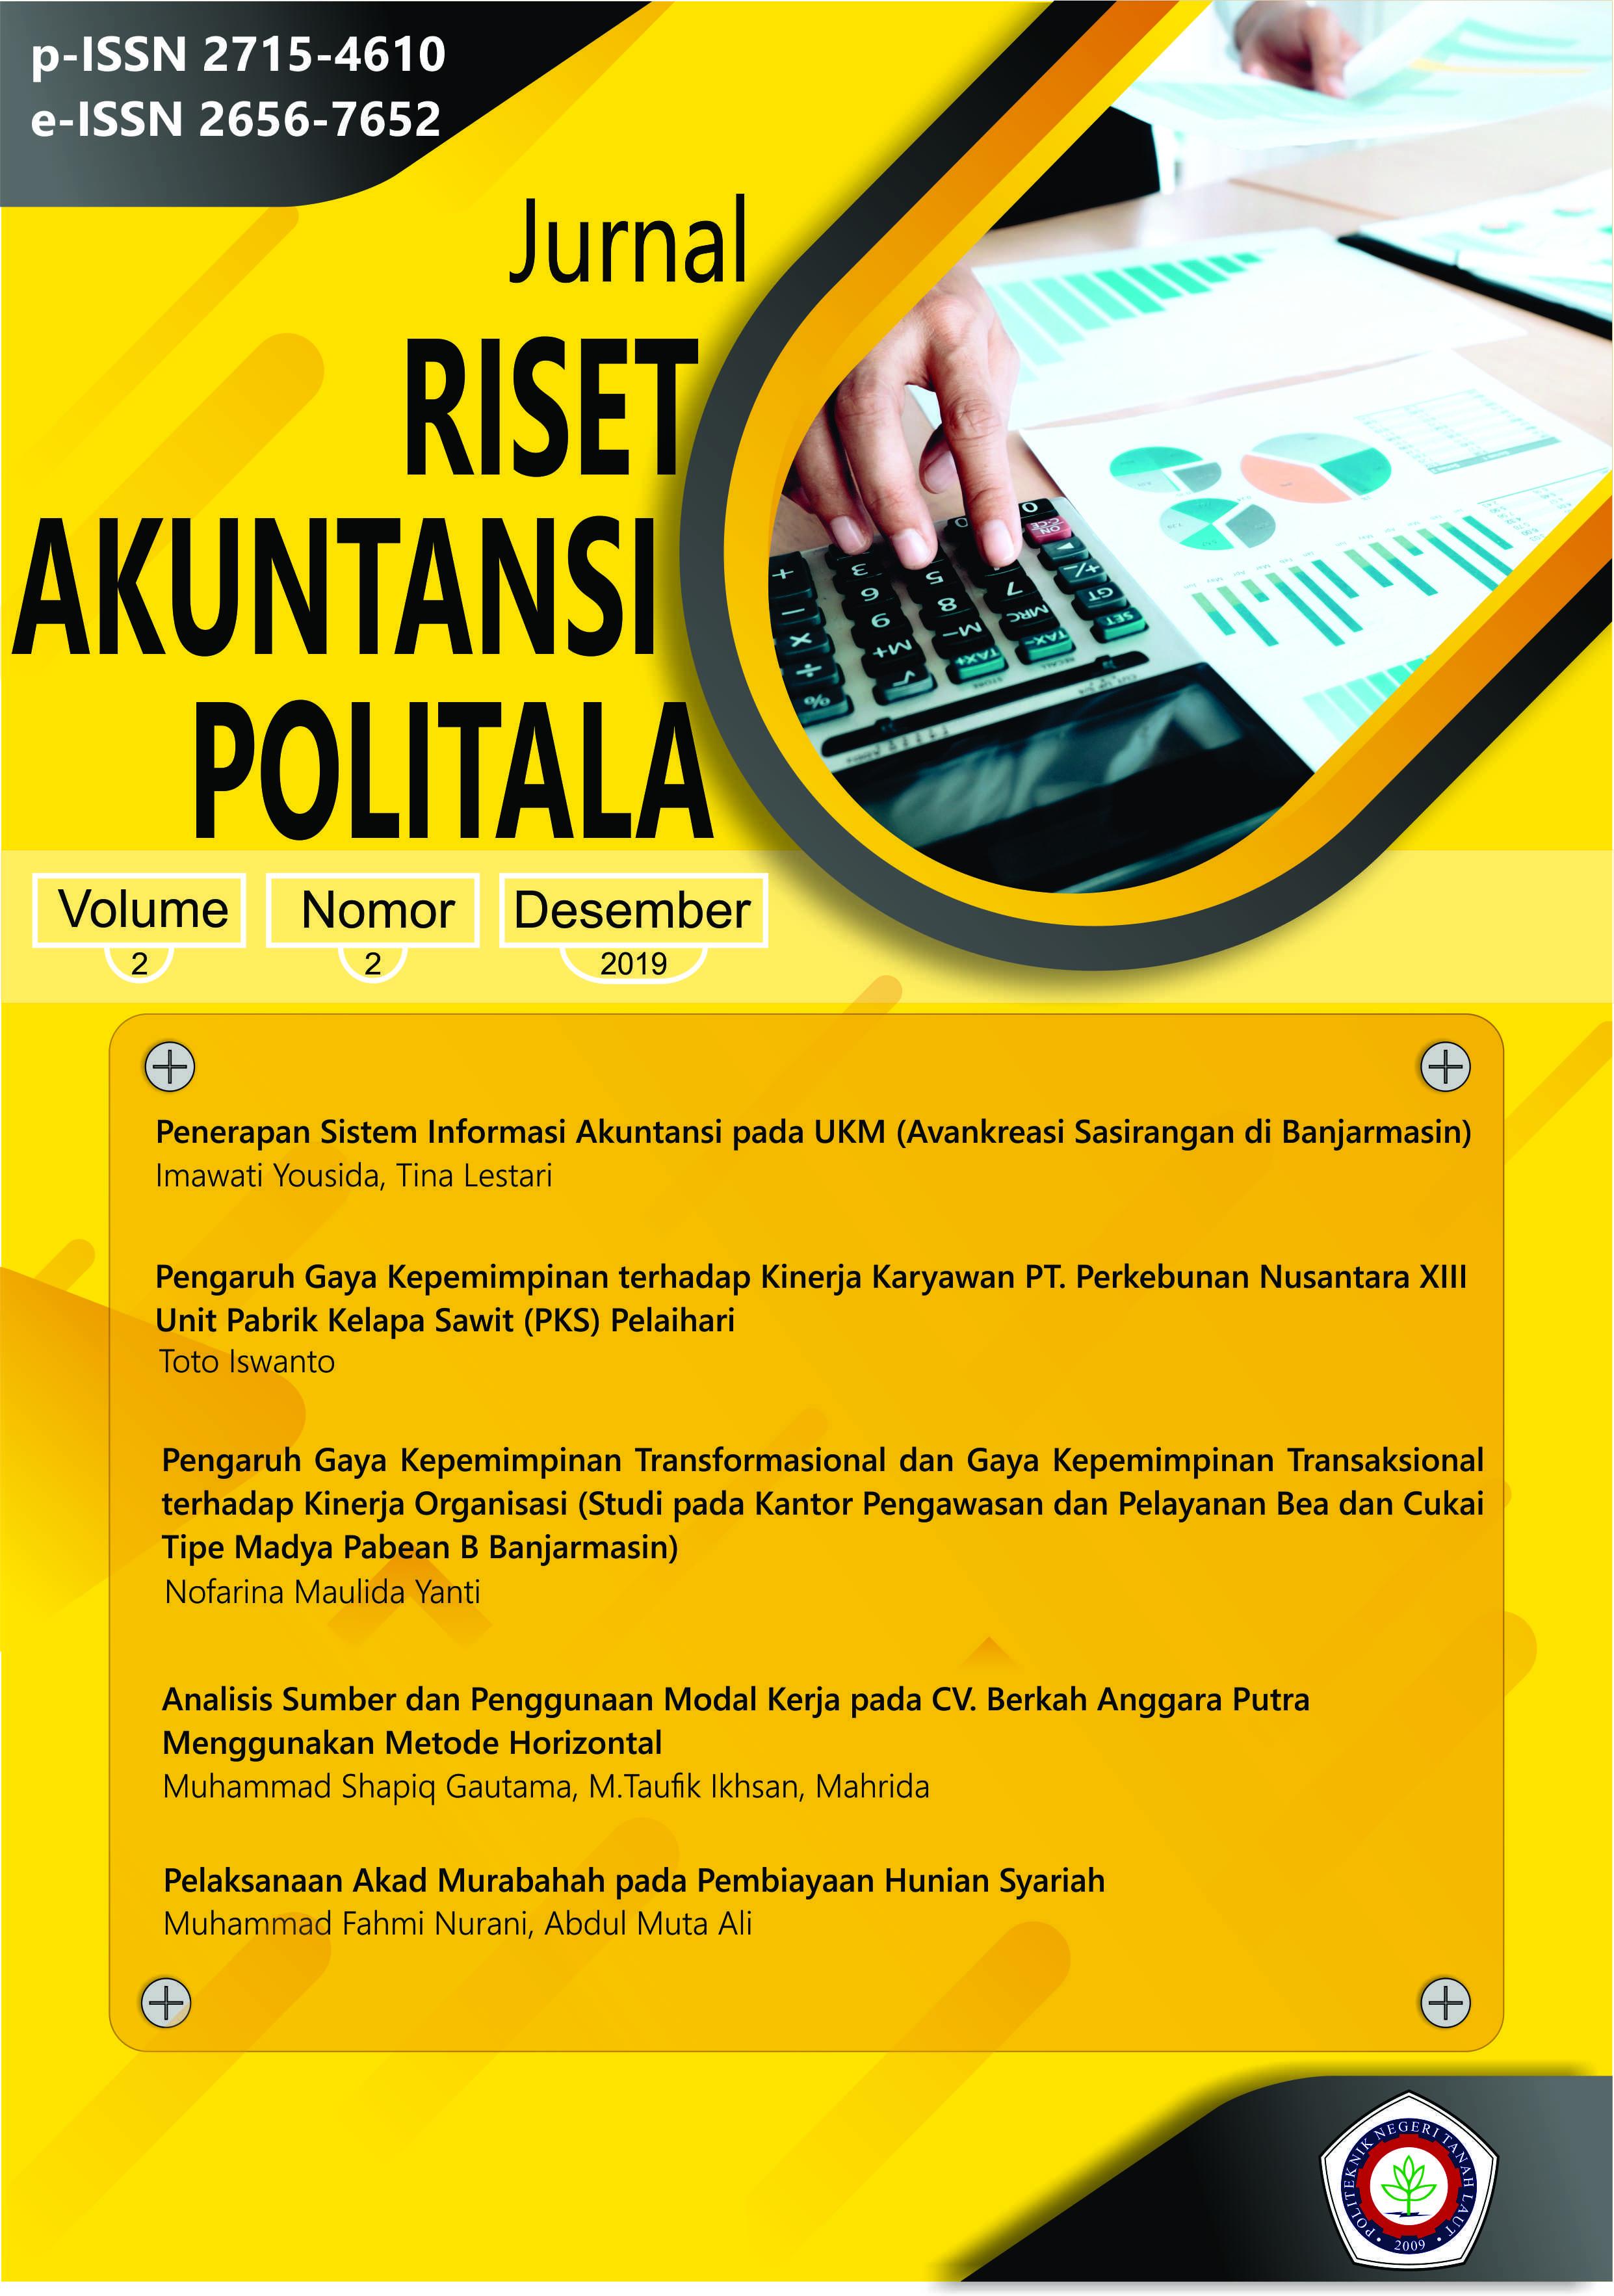 JURNAL RISET AKUNTANSI POLITALA VOL.2, NO.2, OPEMBER 2019